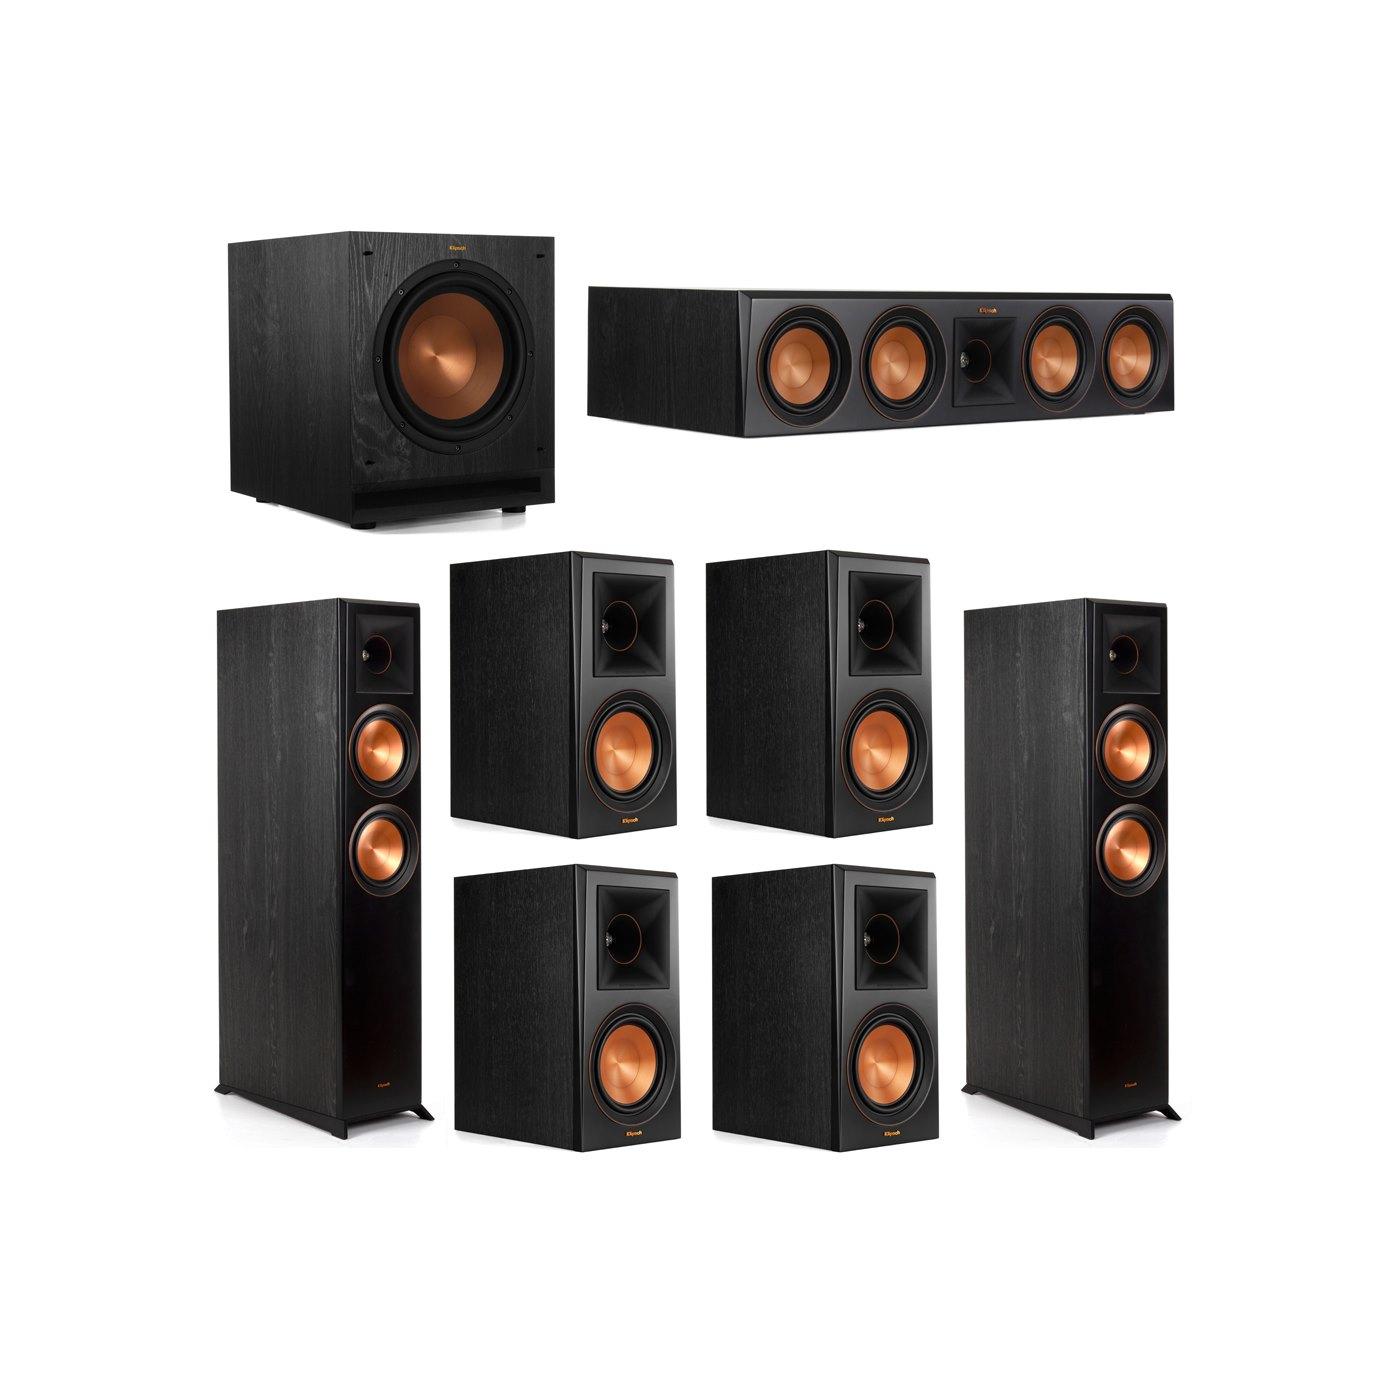 Klipsch 7.1 System with 2 RP-6000F Floorstanding Speakers, 1 Klipsch RP-504C Center Speaker, 4 Klipsch RP-600M Surround Speakers, 1 Klipsch SPL-100 Subwoofer